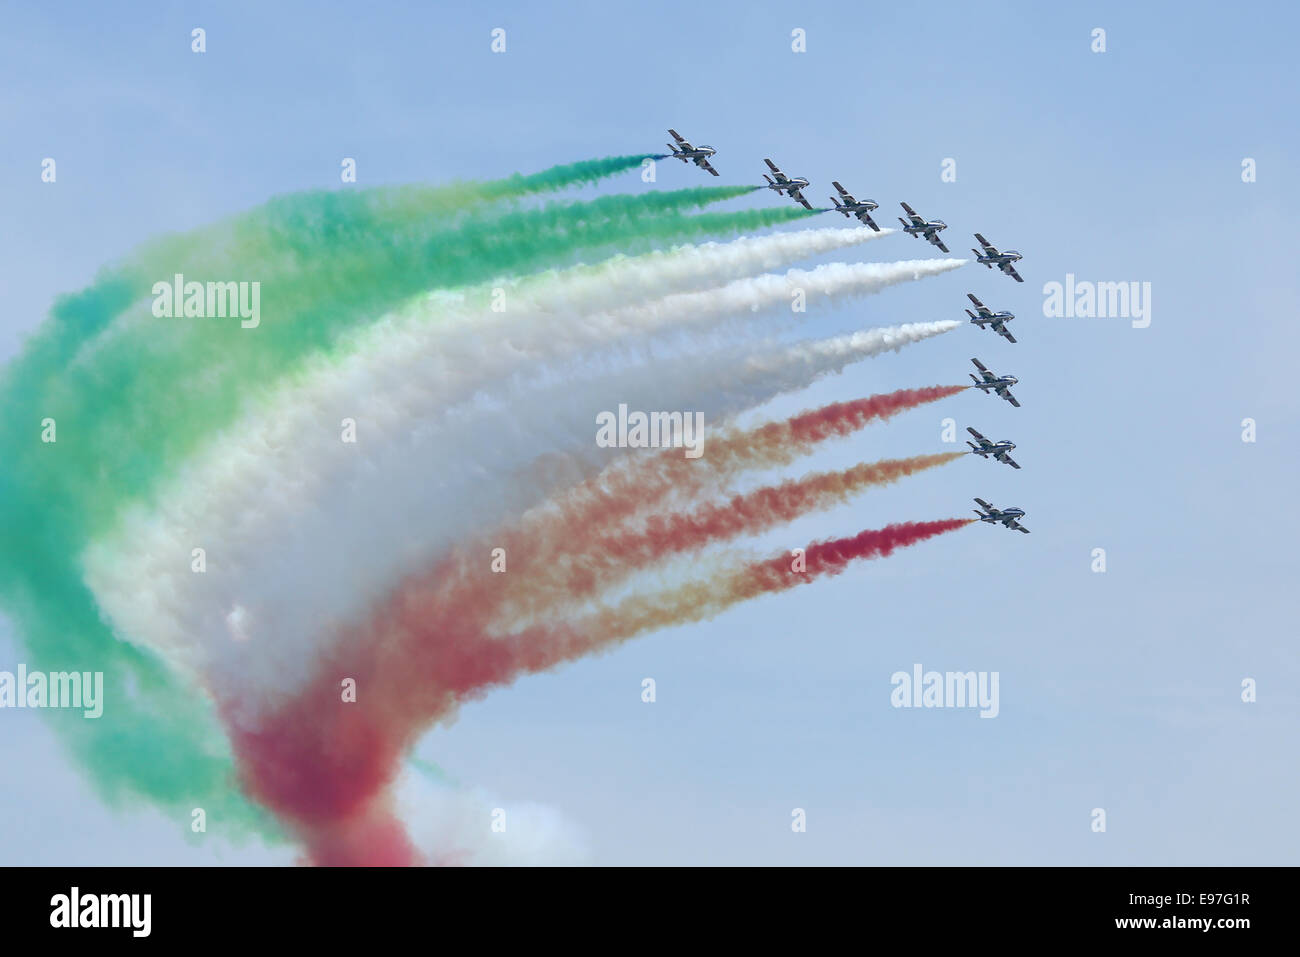 Frecce Tricolori Italian Air Force aerobatic team display at Royal International Air Tattoo 2014 Stock Photo